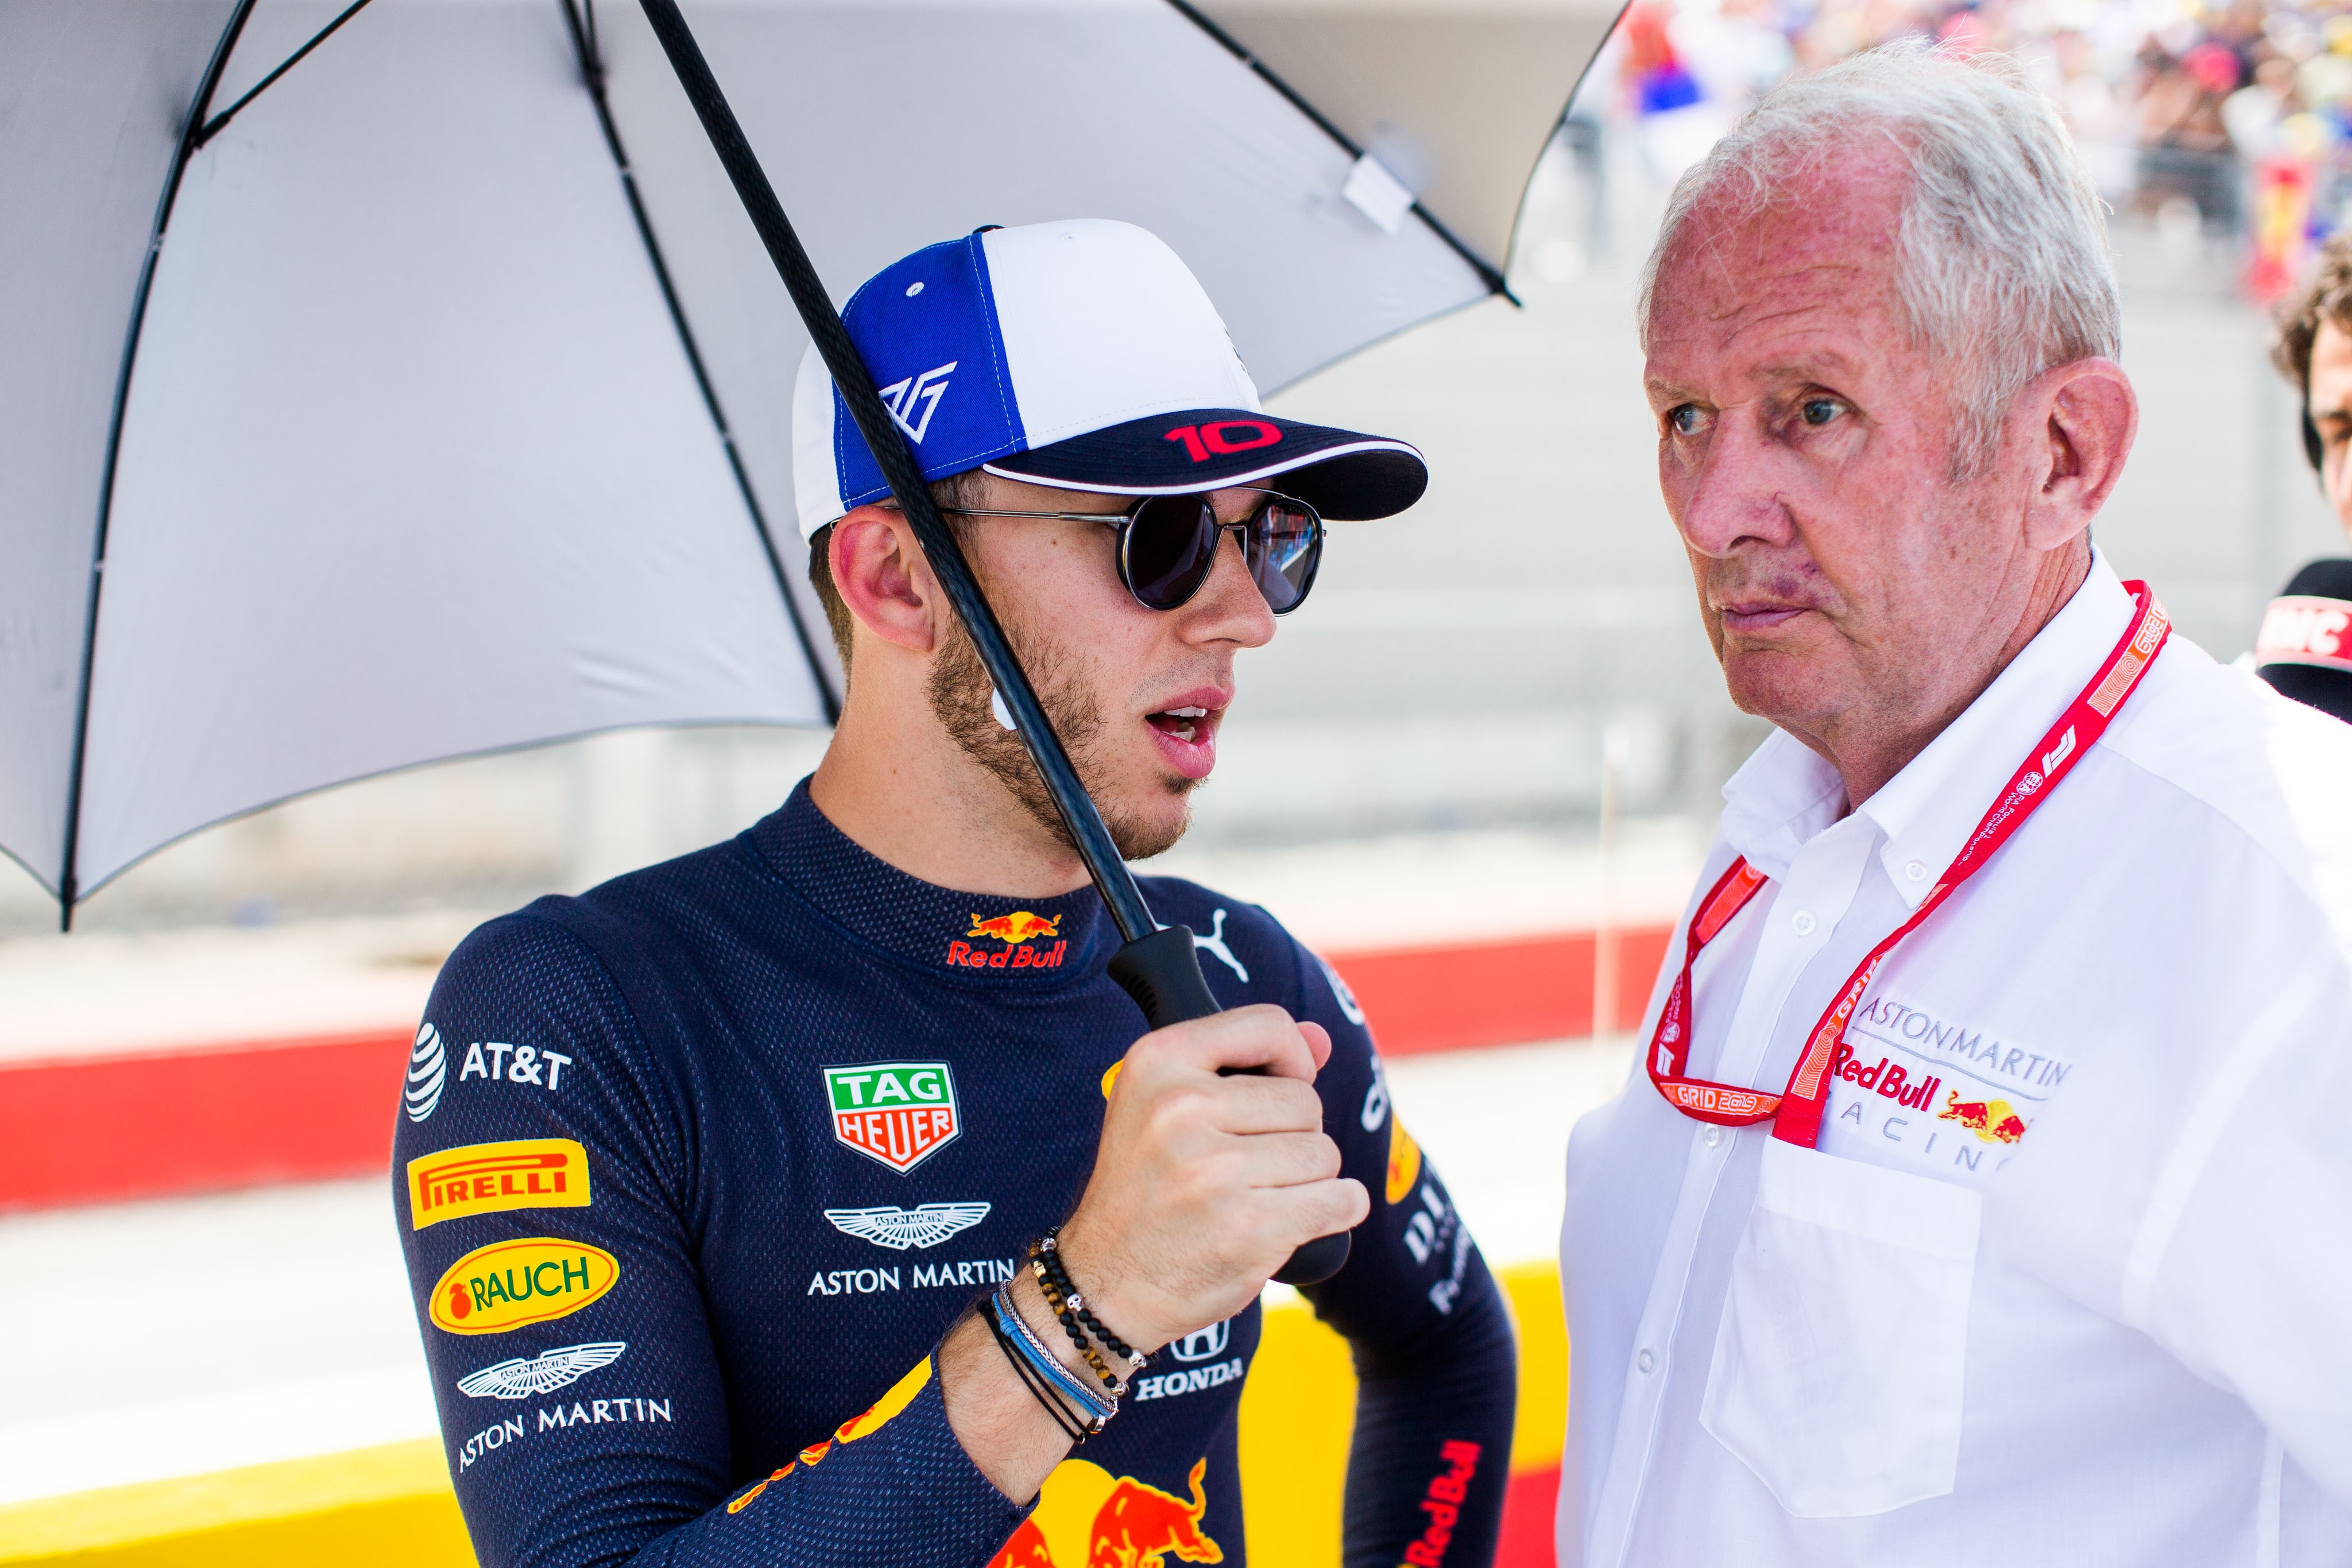 Pierre Gasly et Helmut Marko (Red Bull) au Grand Prix de France 2019